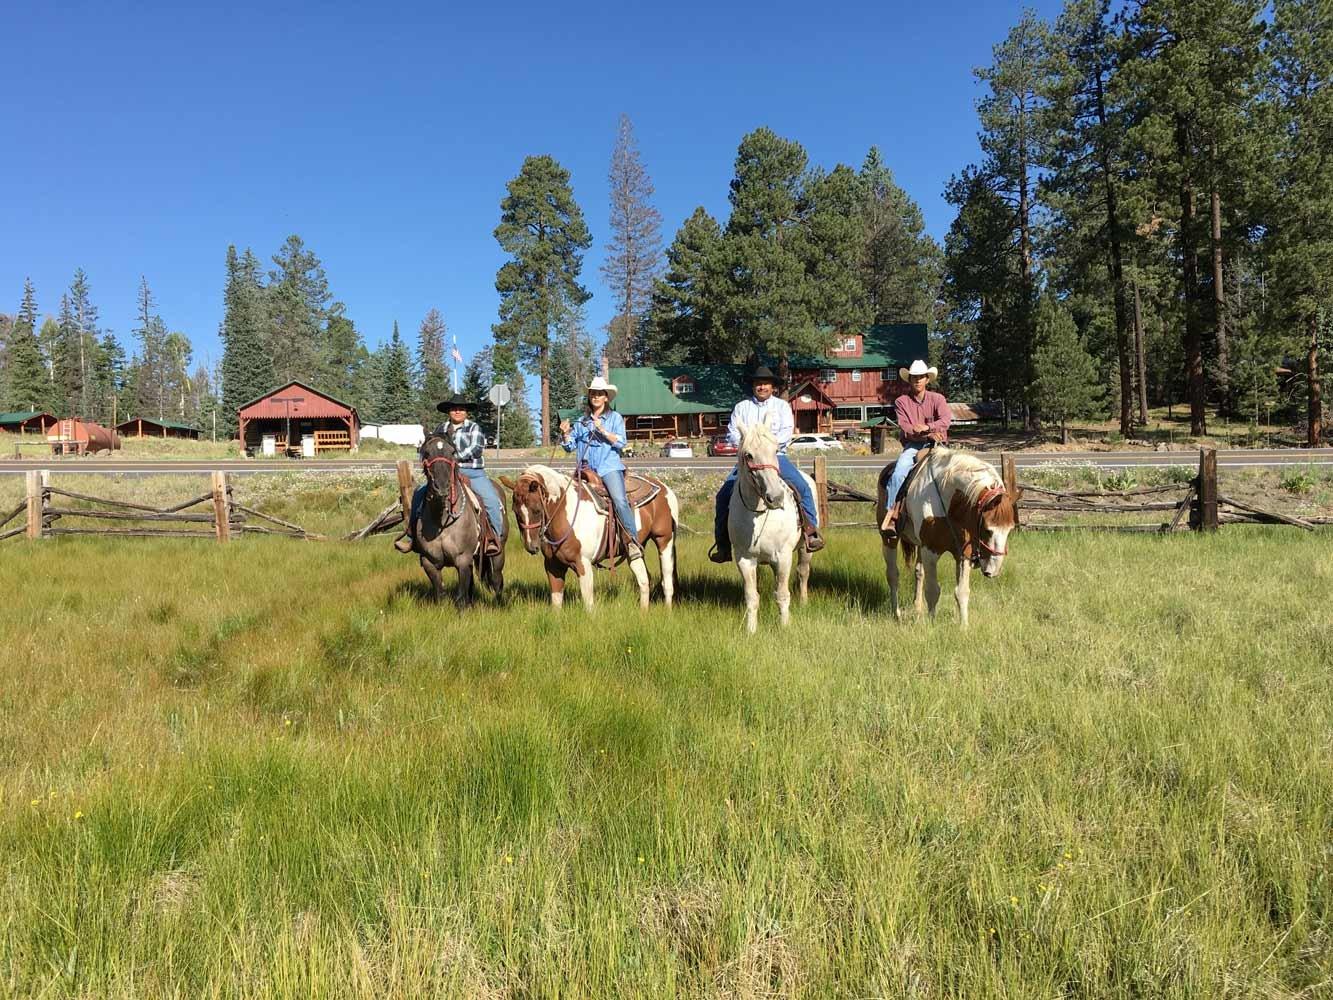 Horseback riding at White Mountains Adventures